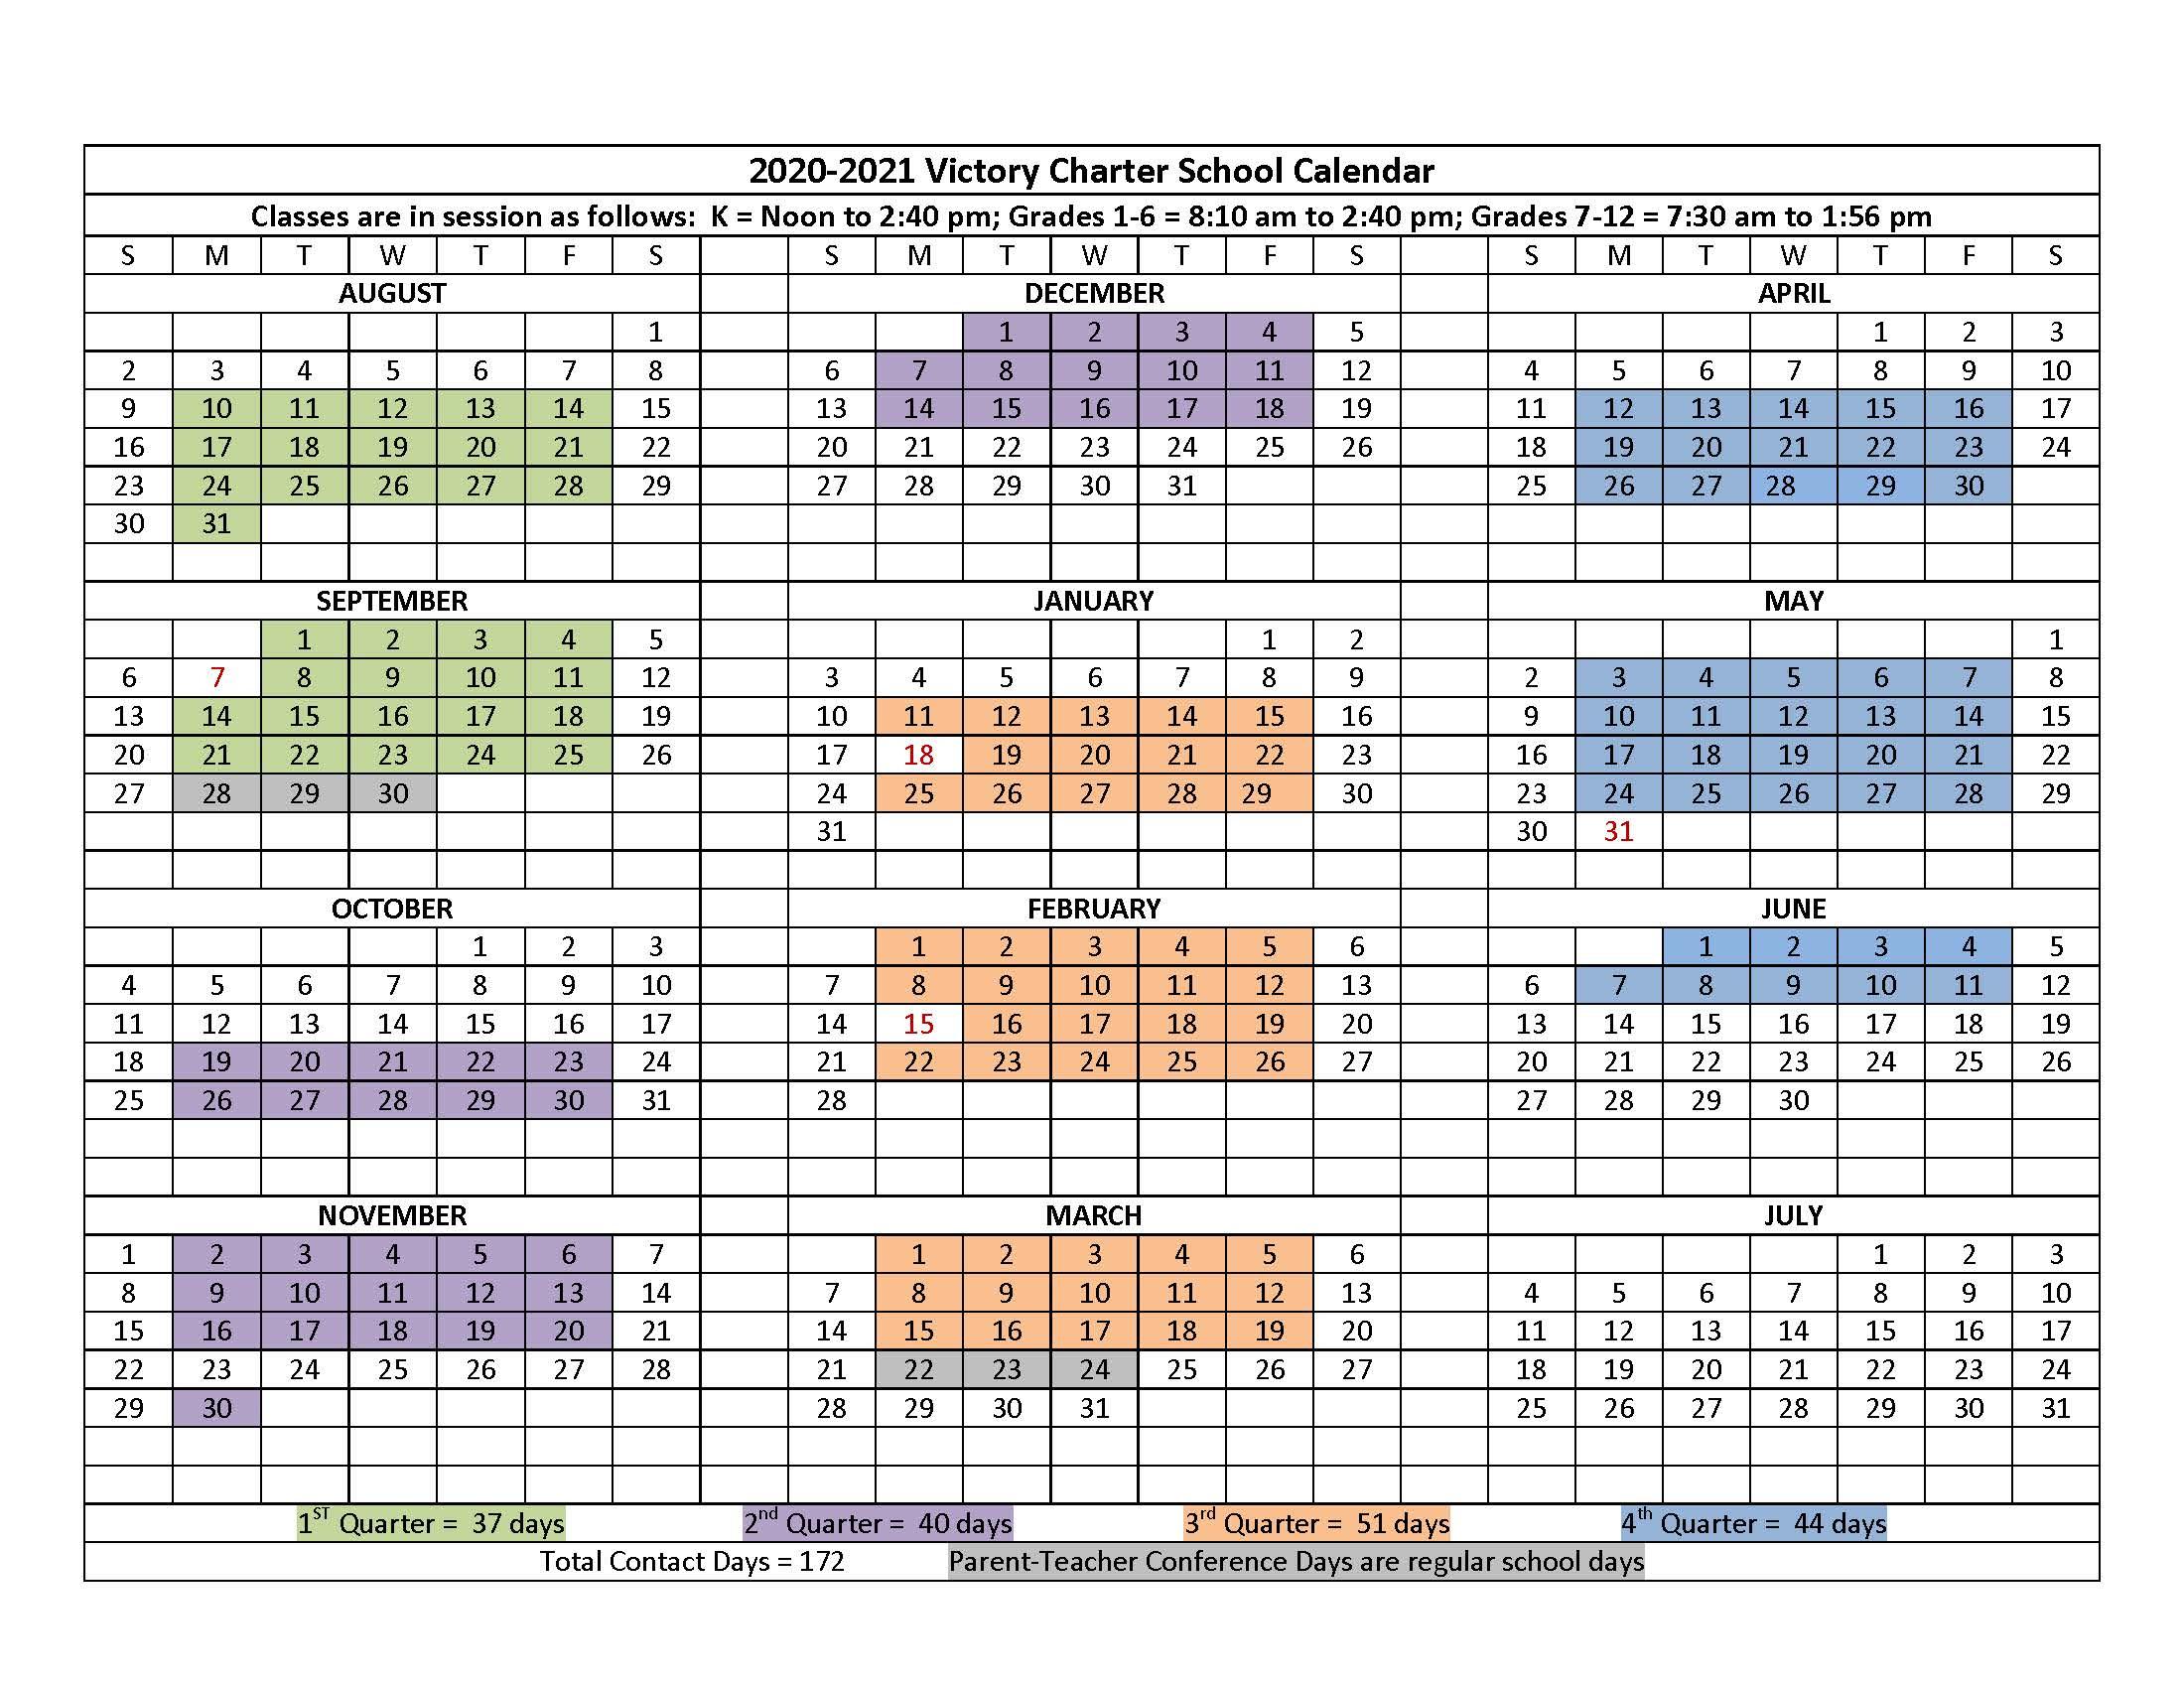 2020-2021 Calendar | Victory Charter School